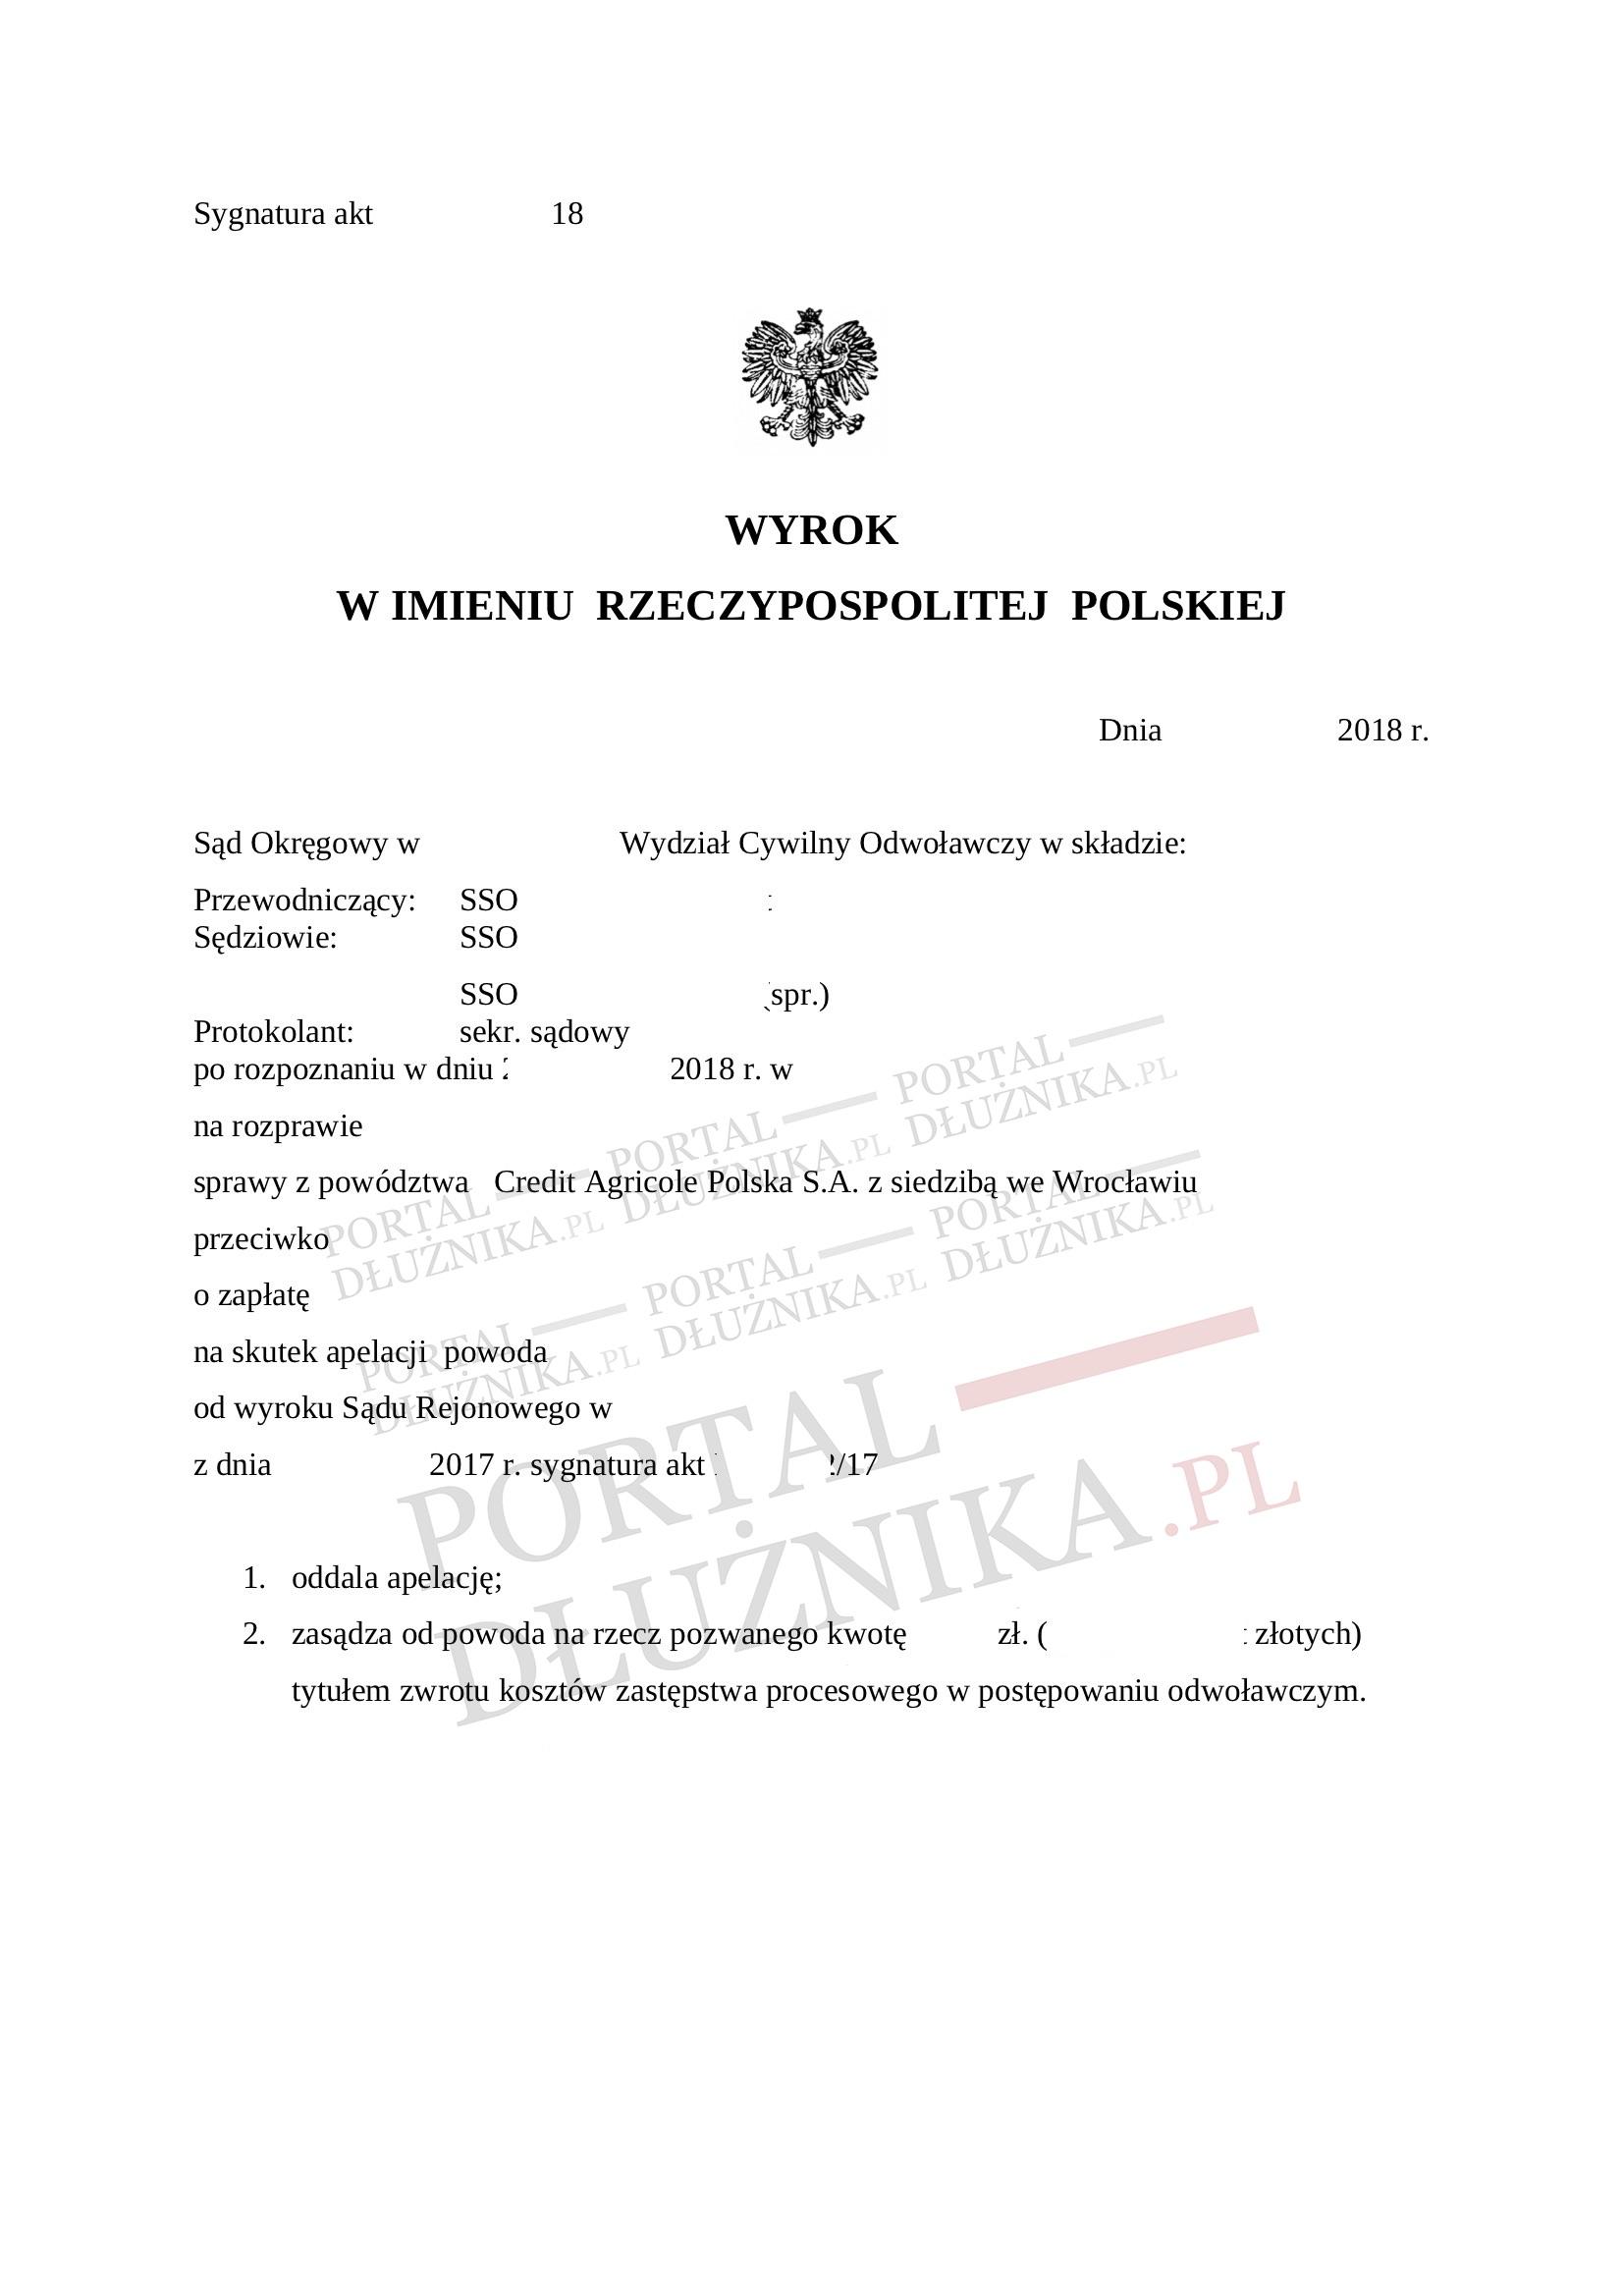 Apelacja Credit Agricole